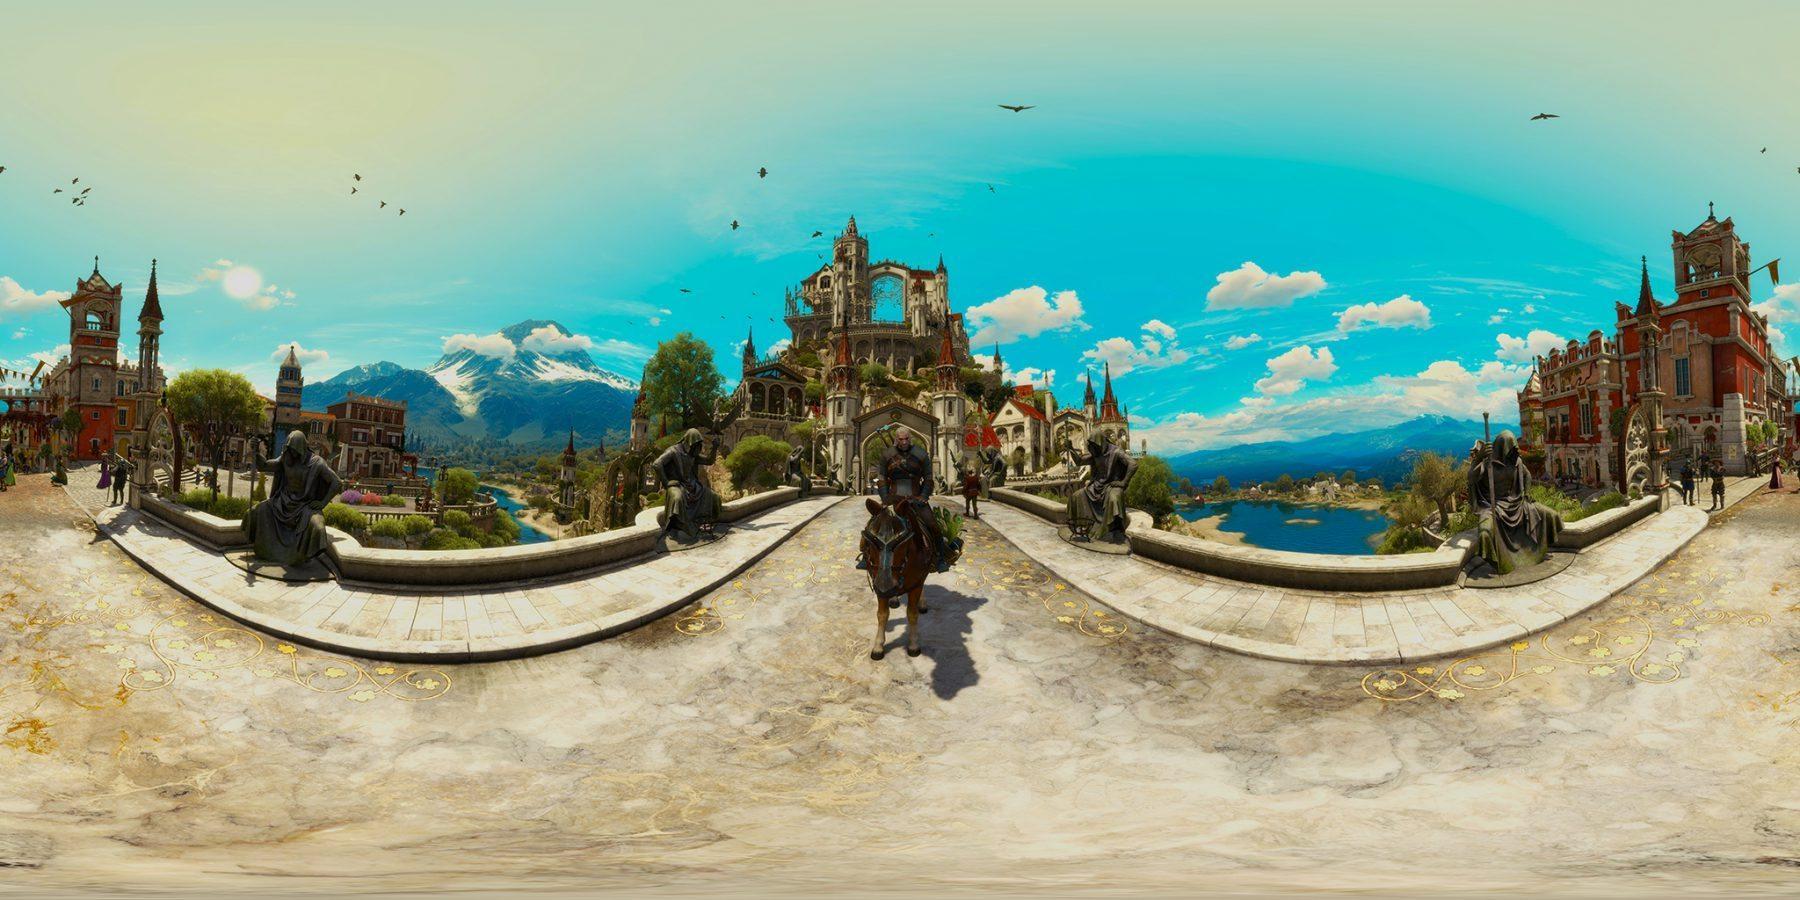 Пример панорамы 360°